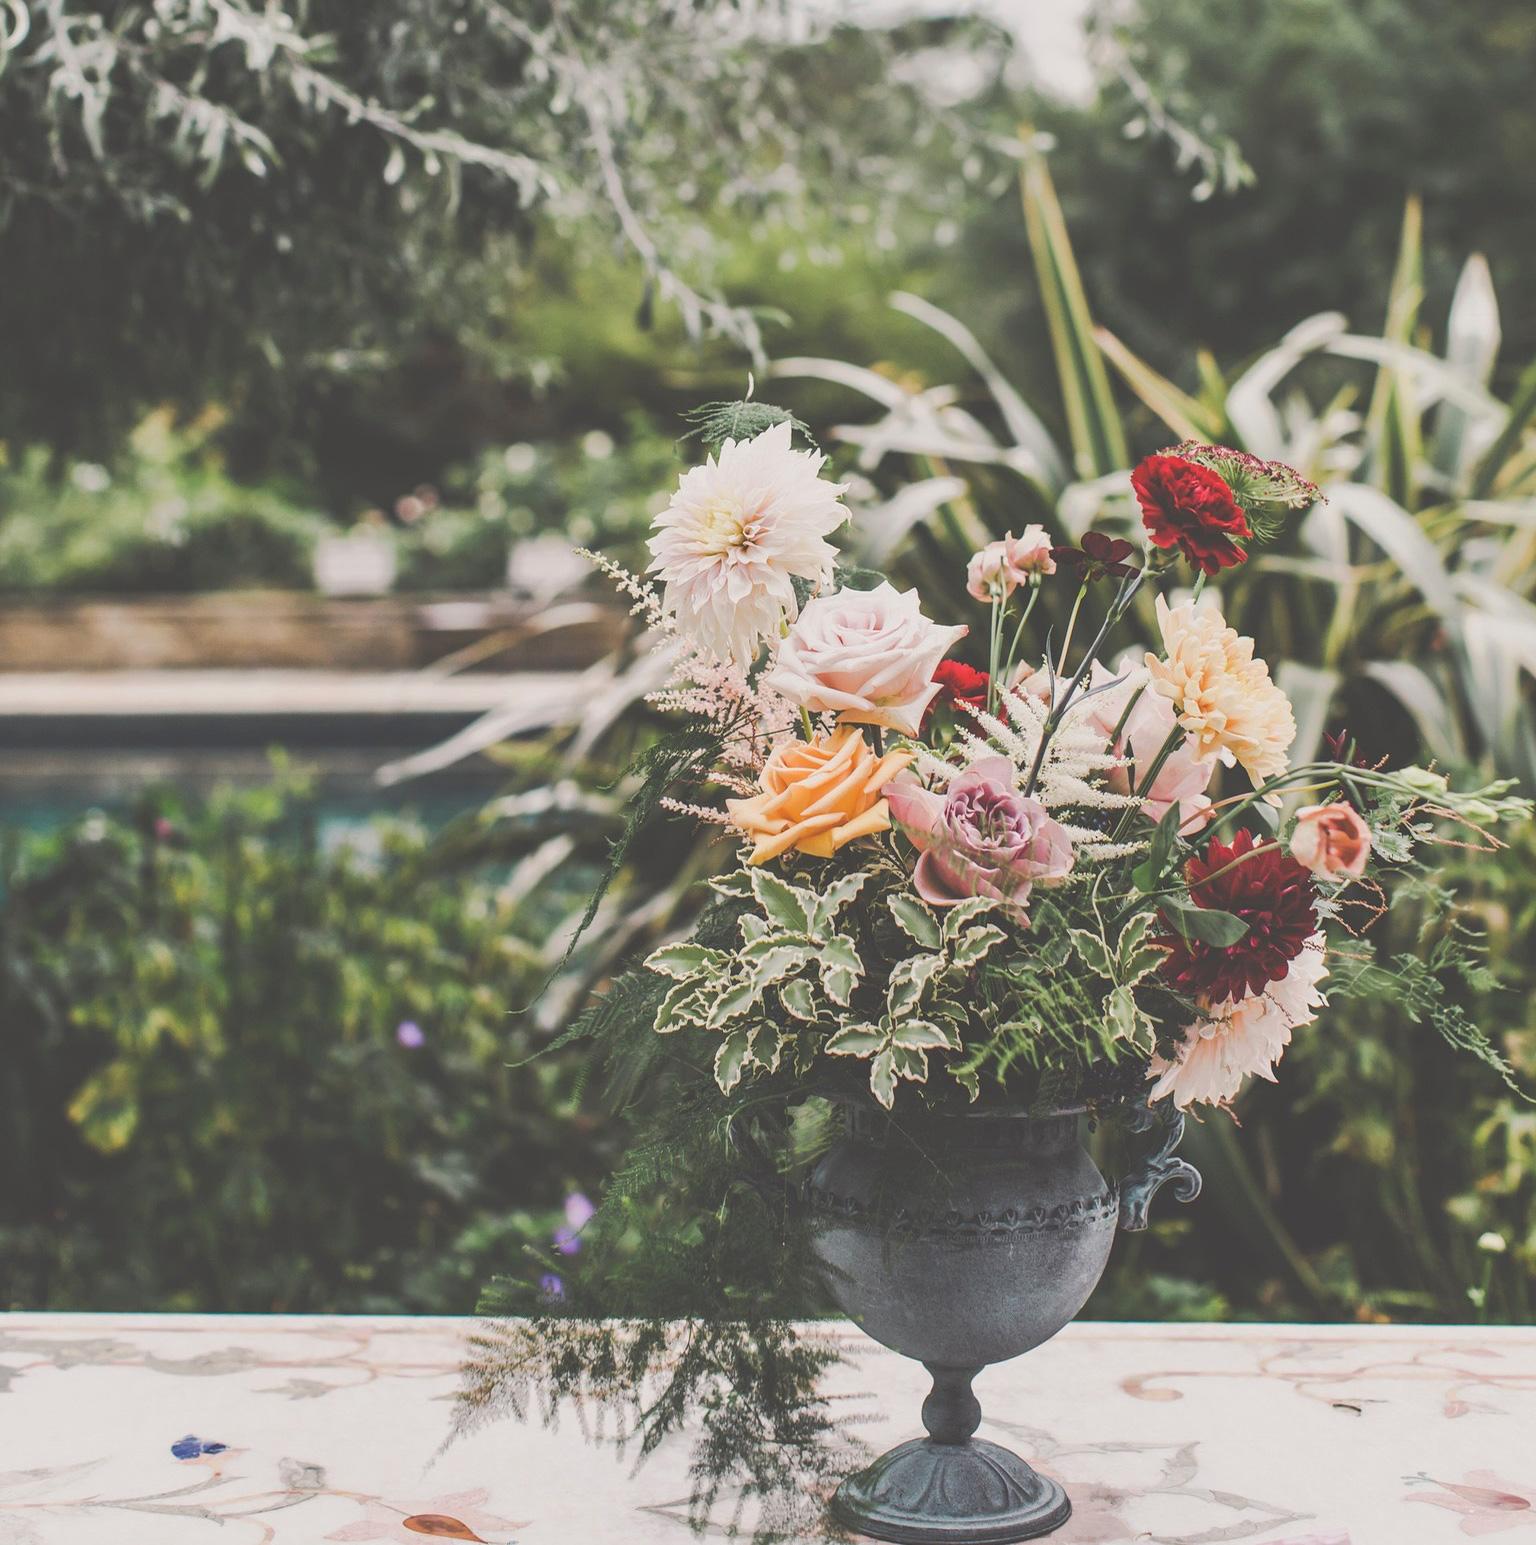 saint floral flowers at wickham house, berkshire